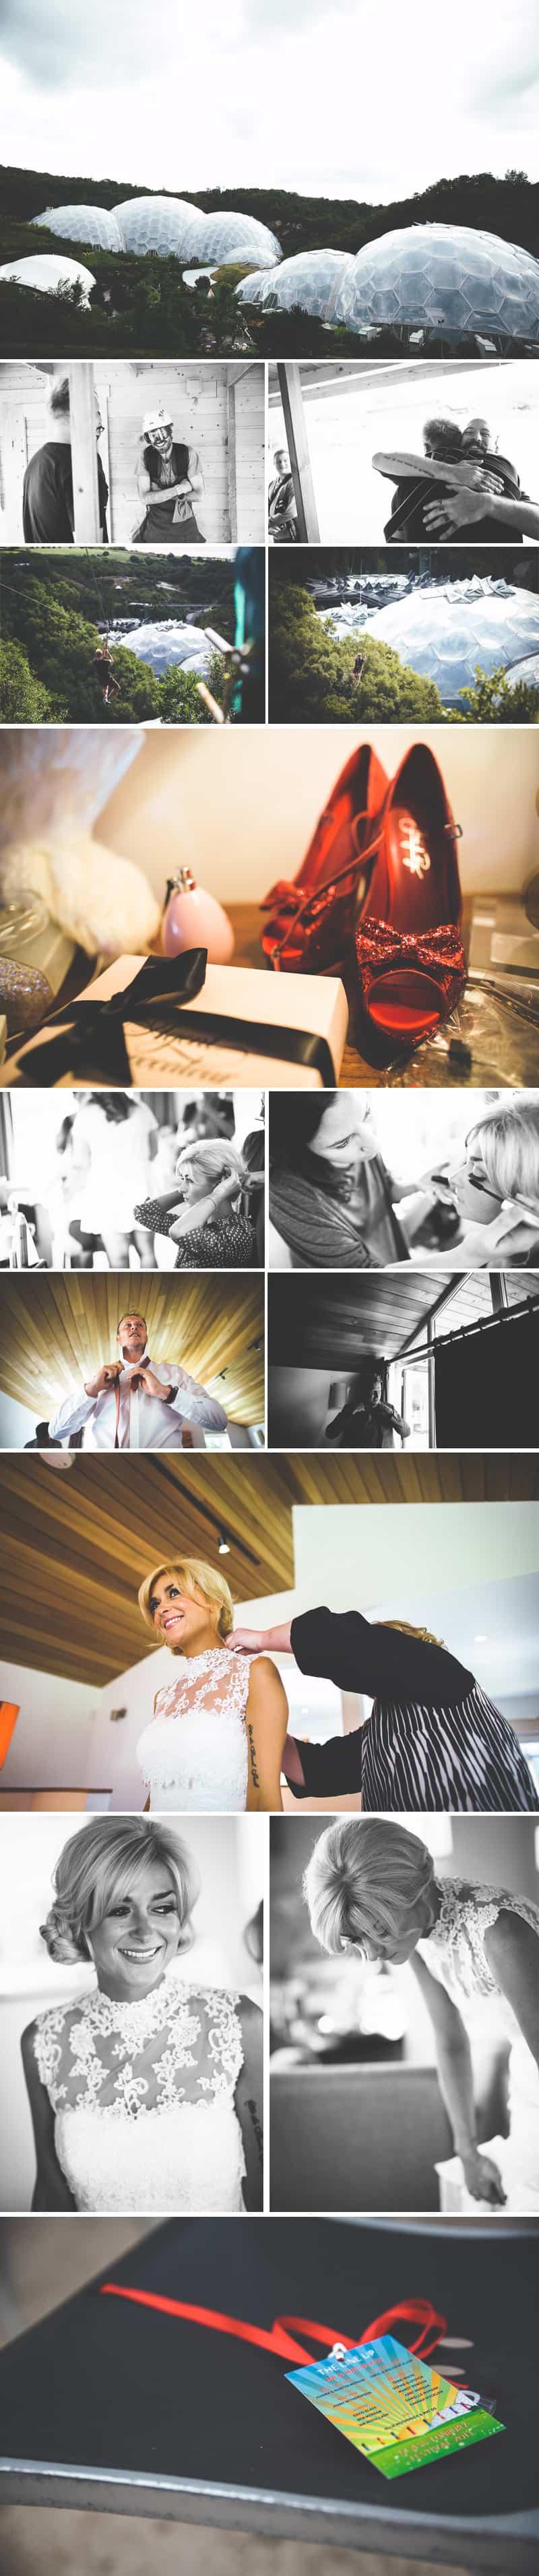 Glastonbury Eden Project Wedding Zip Lining Festival Themed